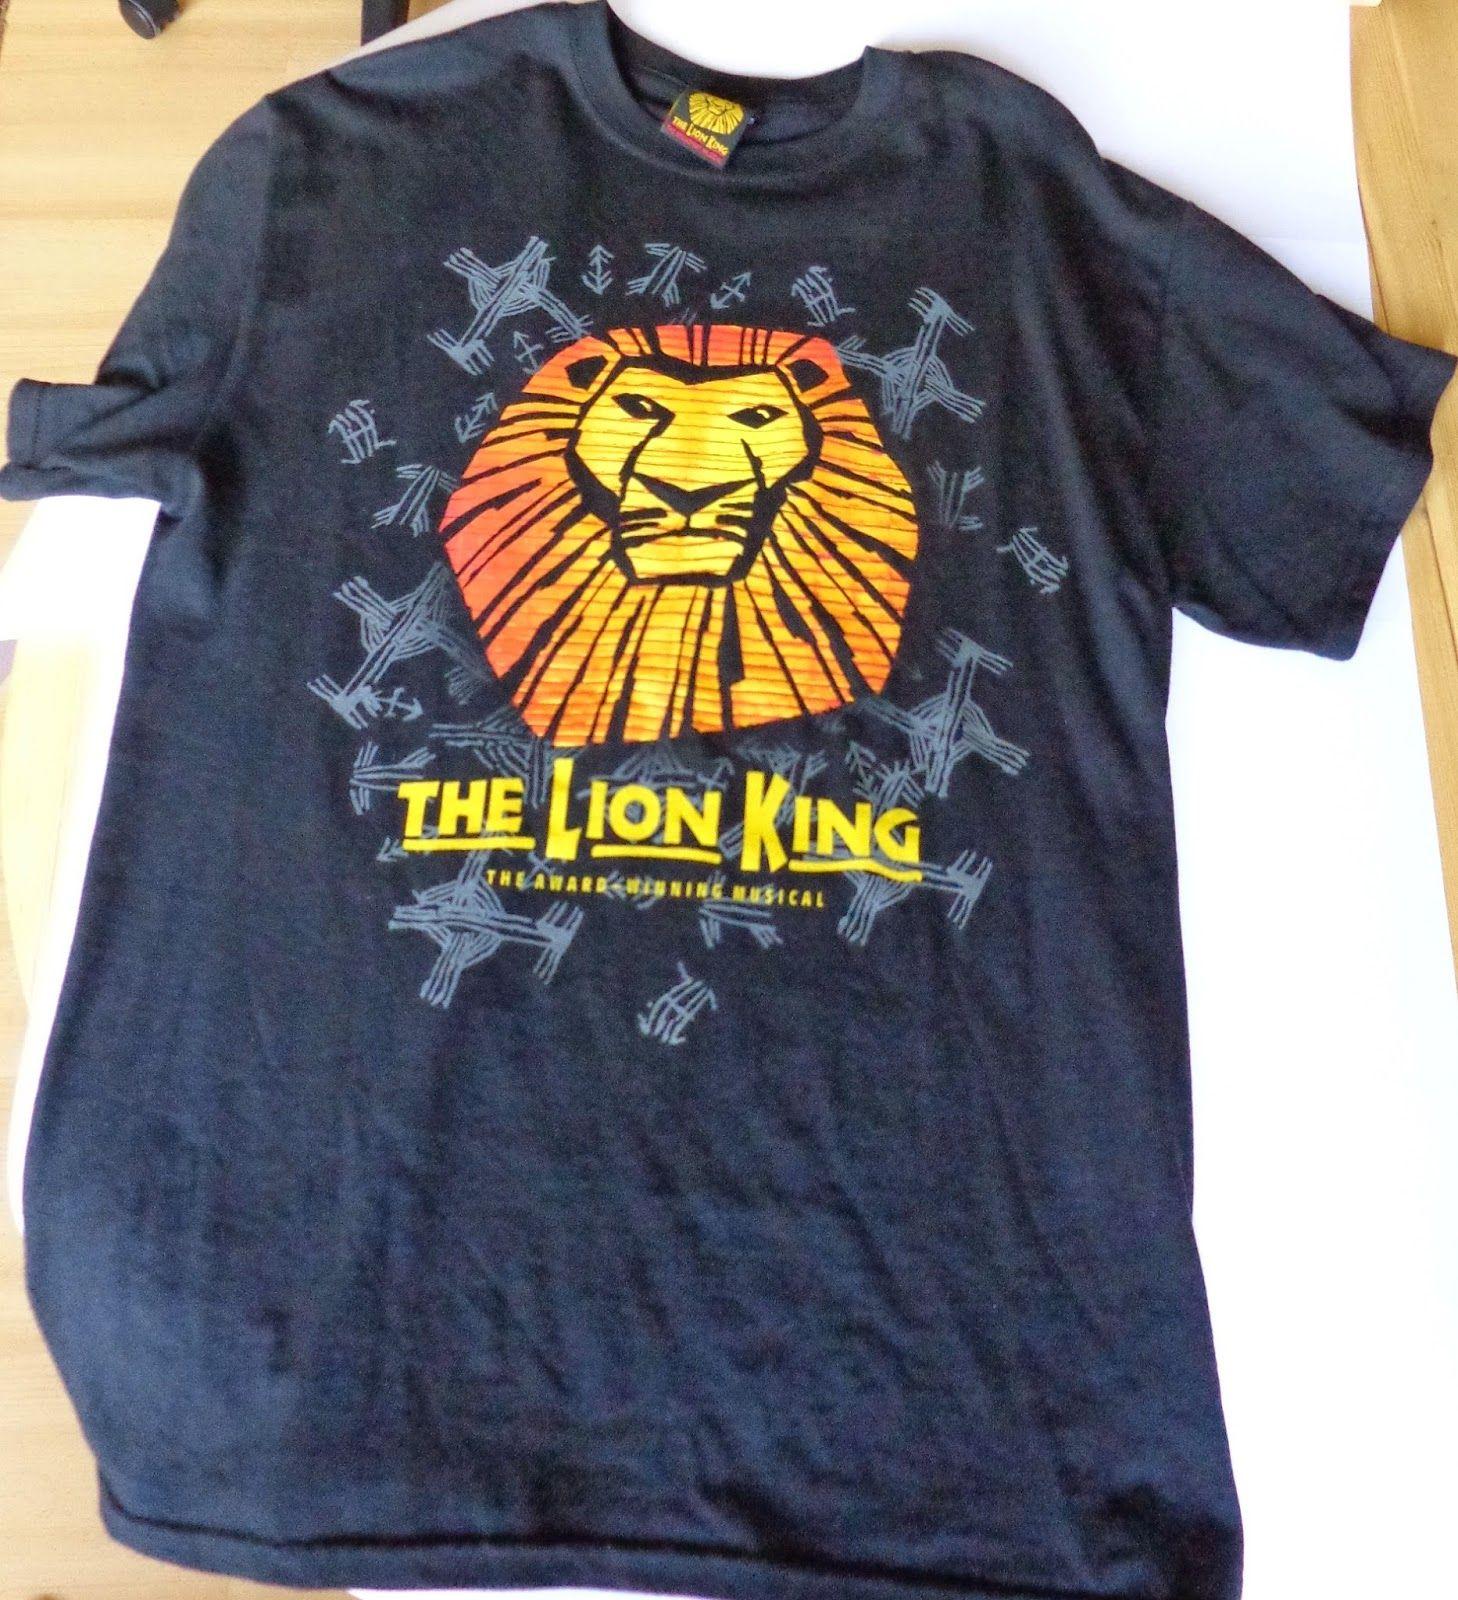 MDC: The Lion King Musical T-shirt London